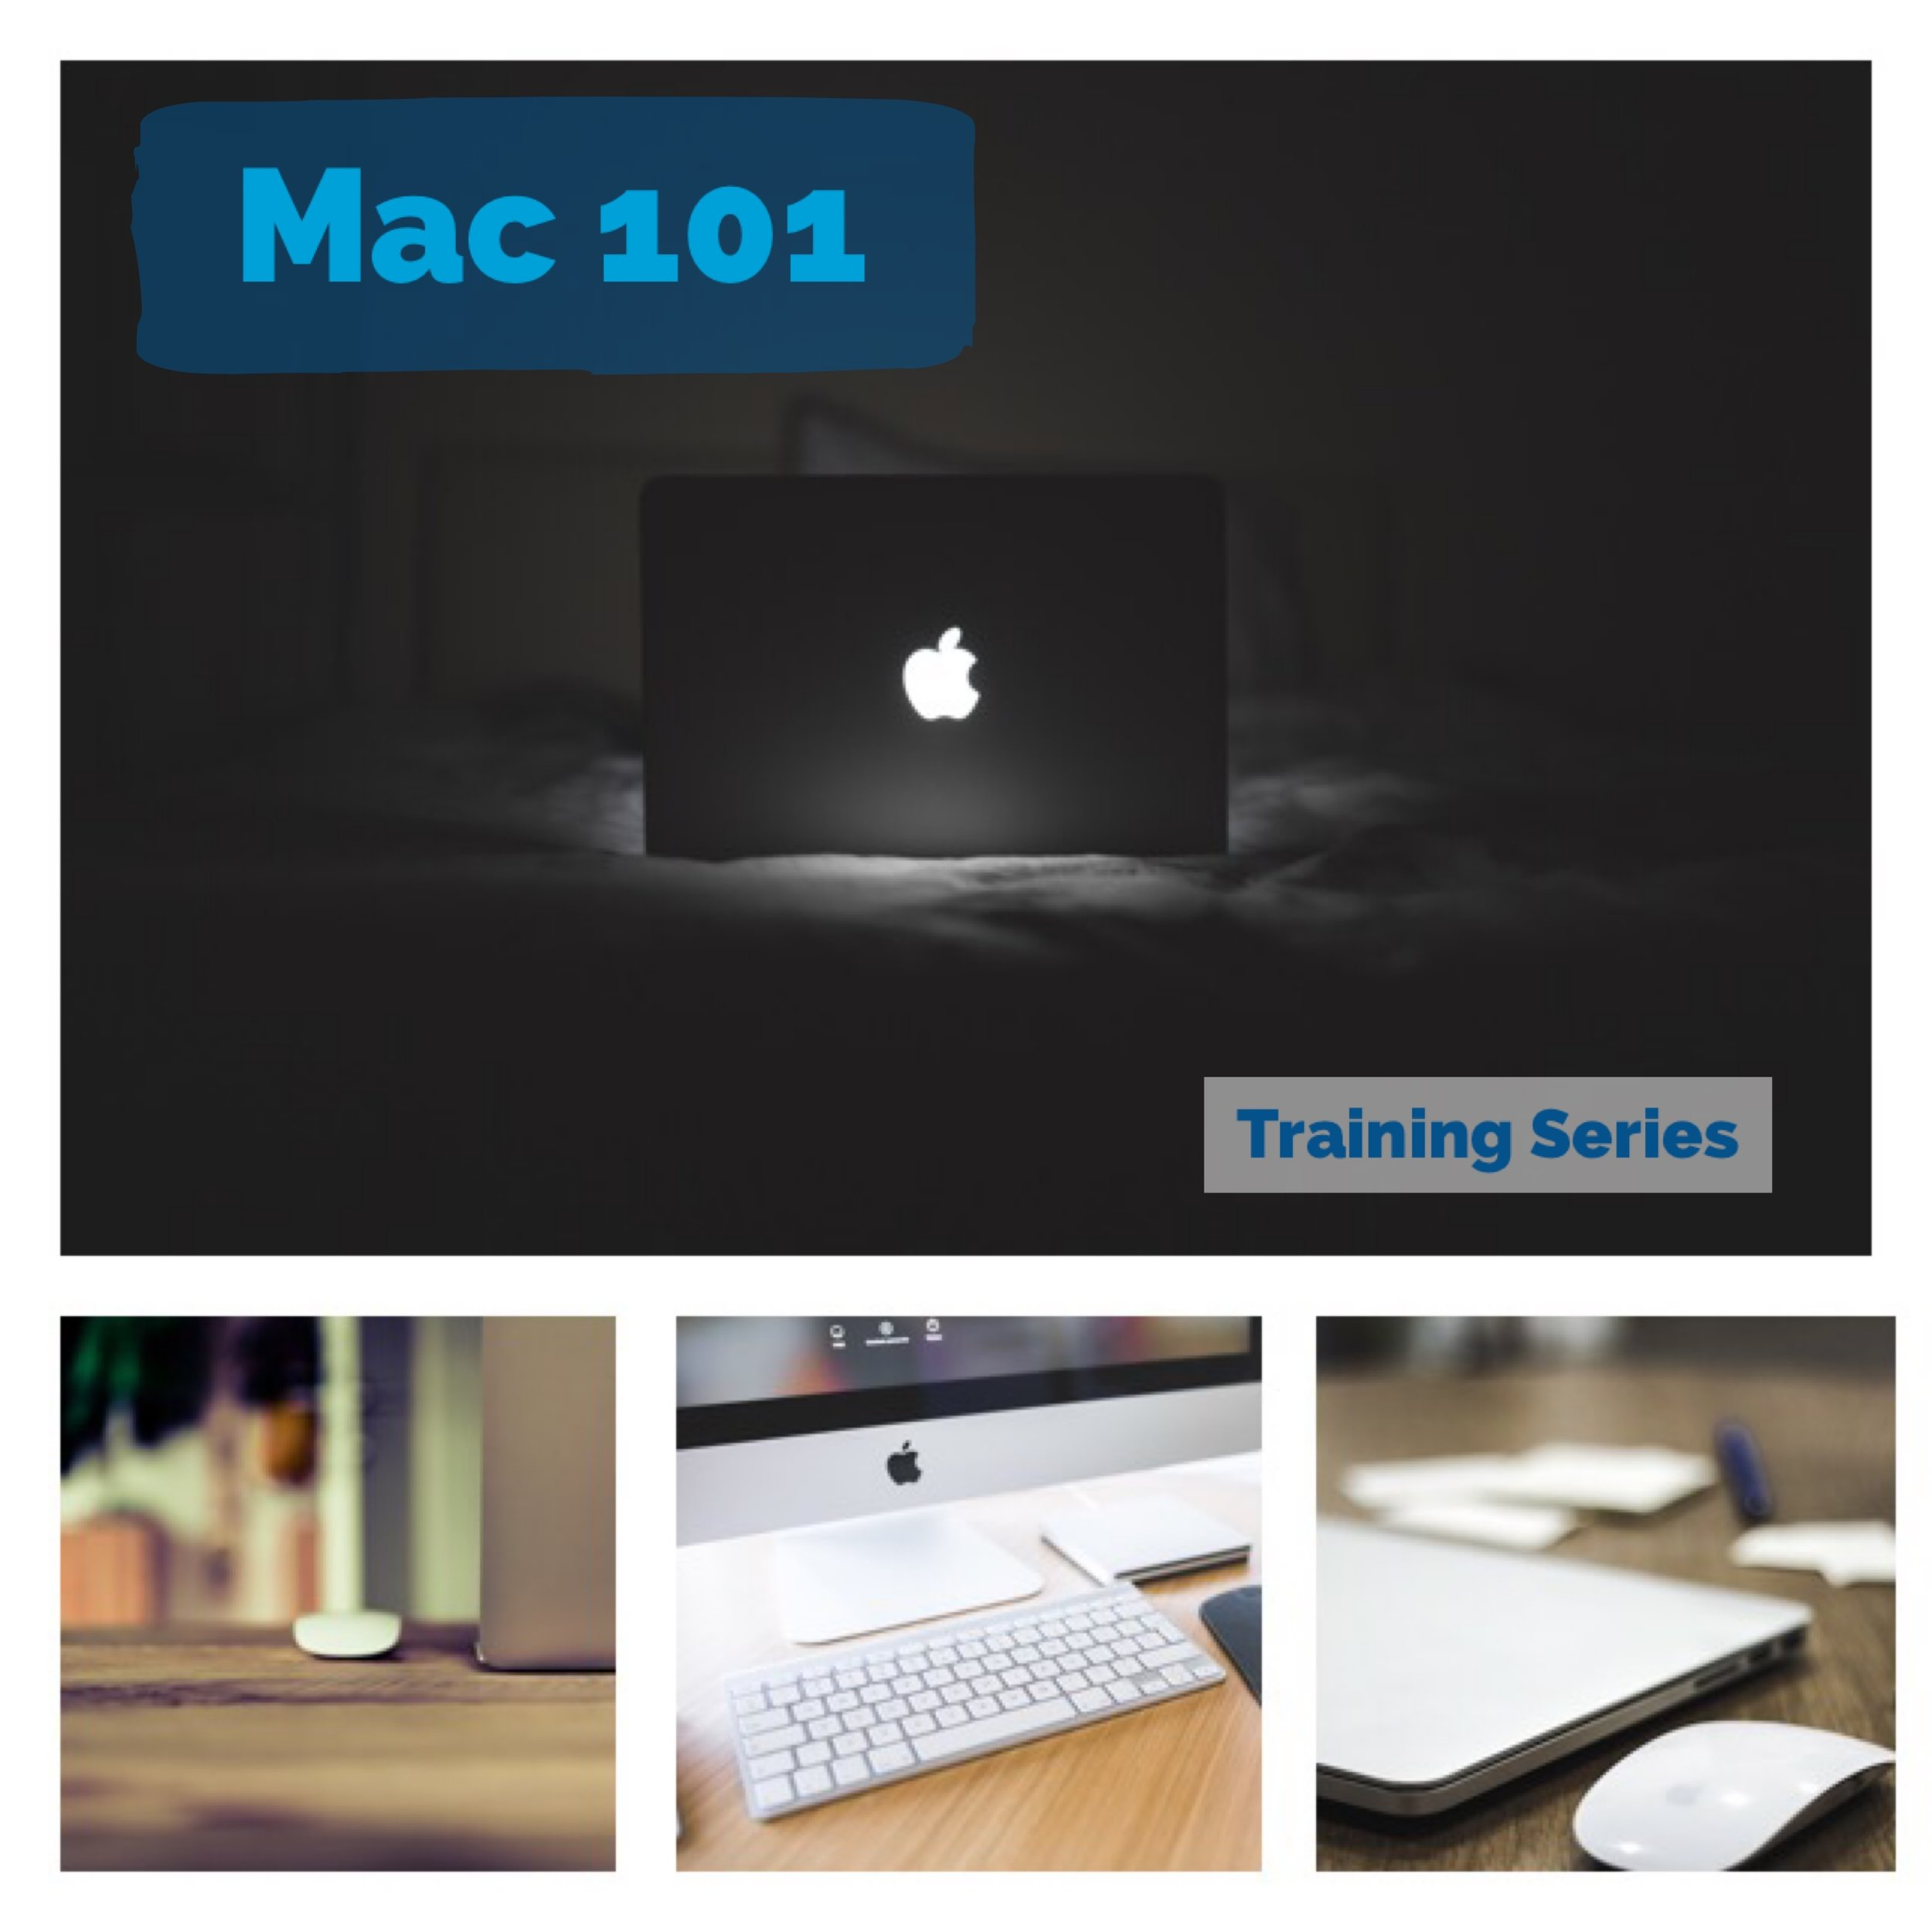 Mac 101 Training Series